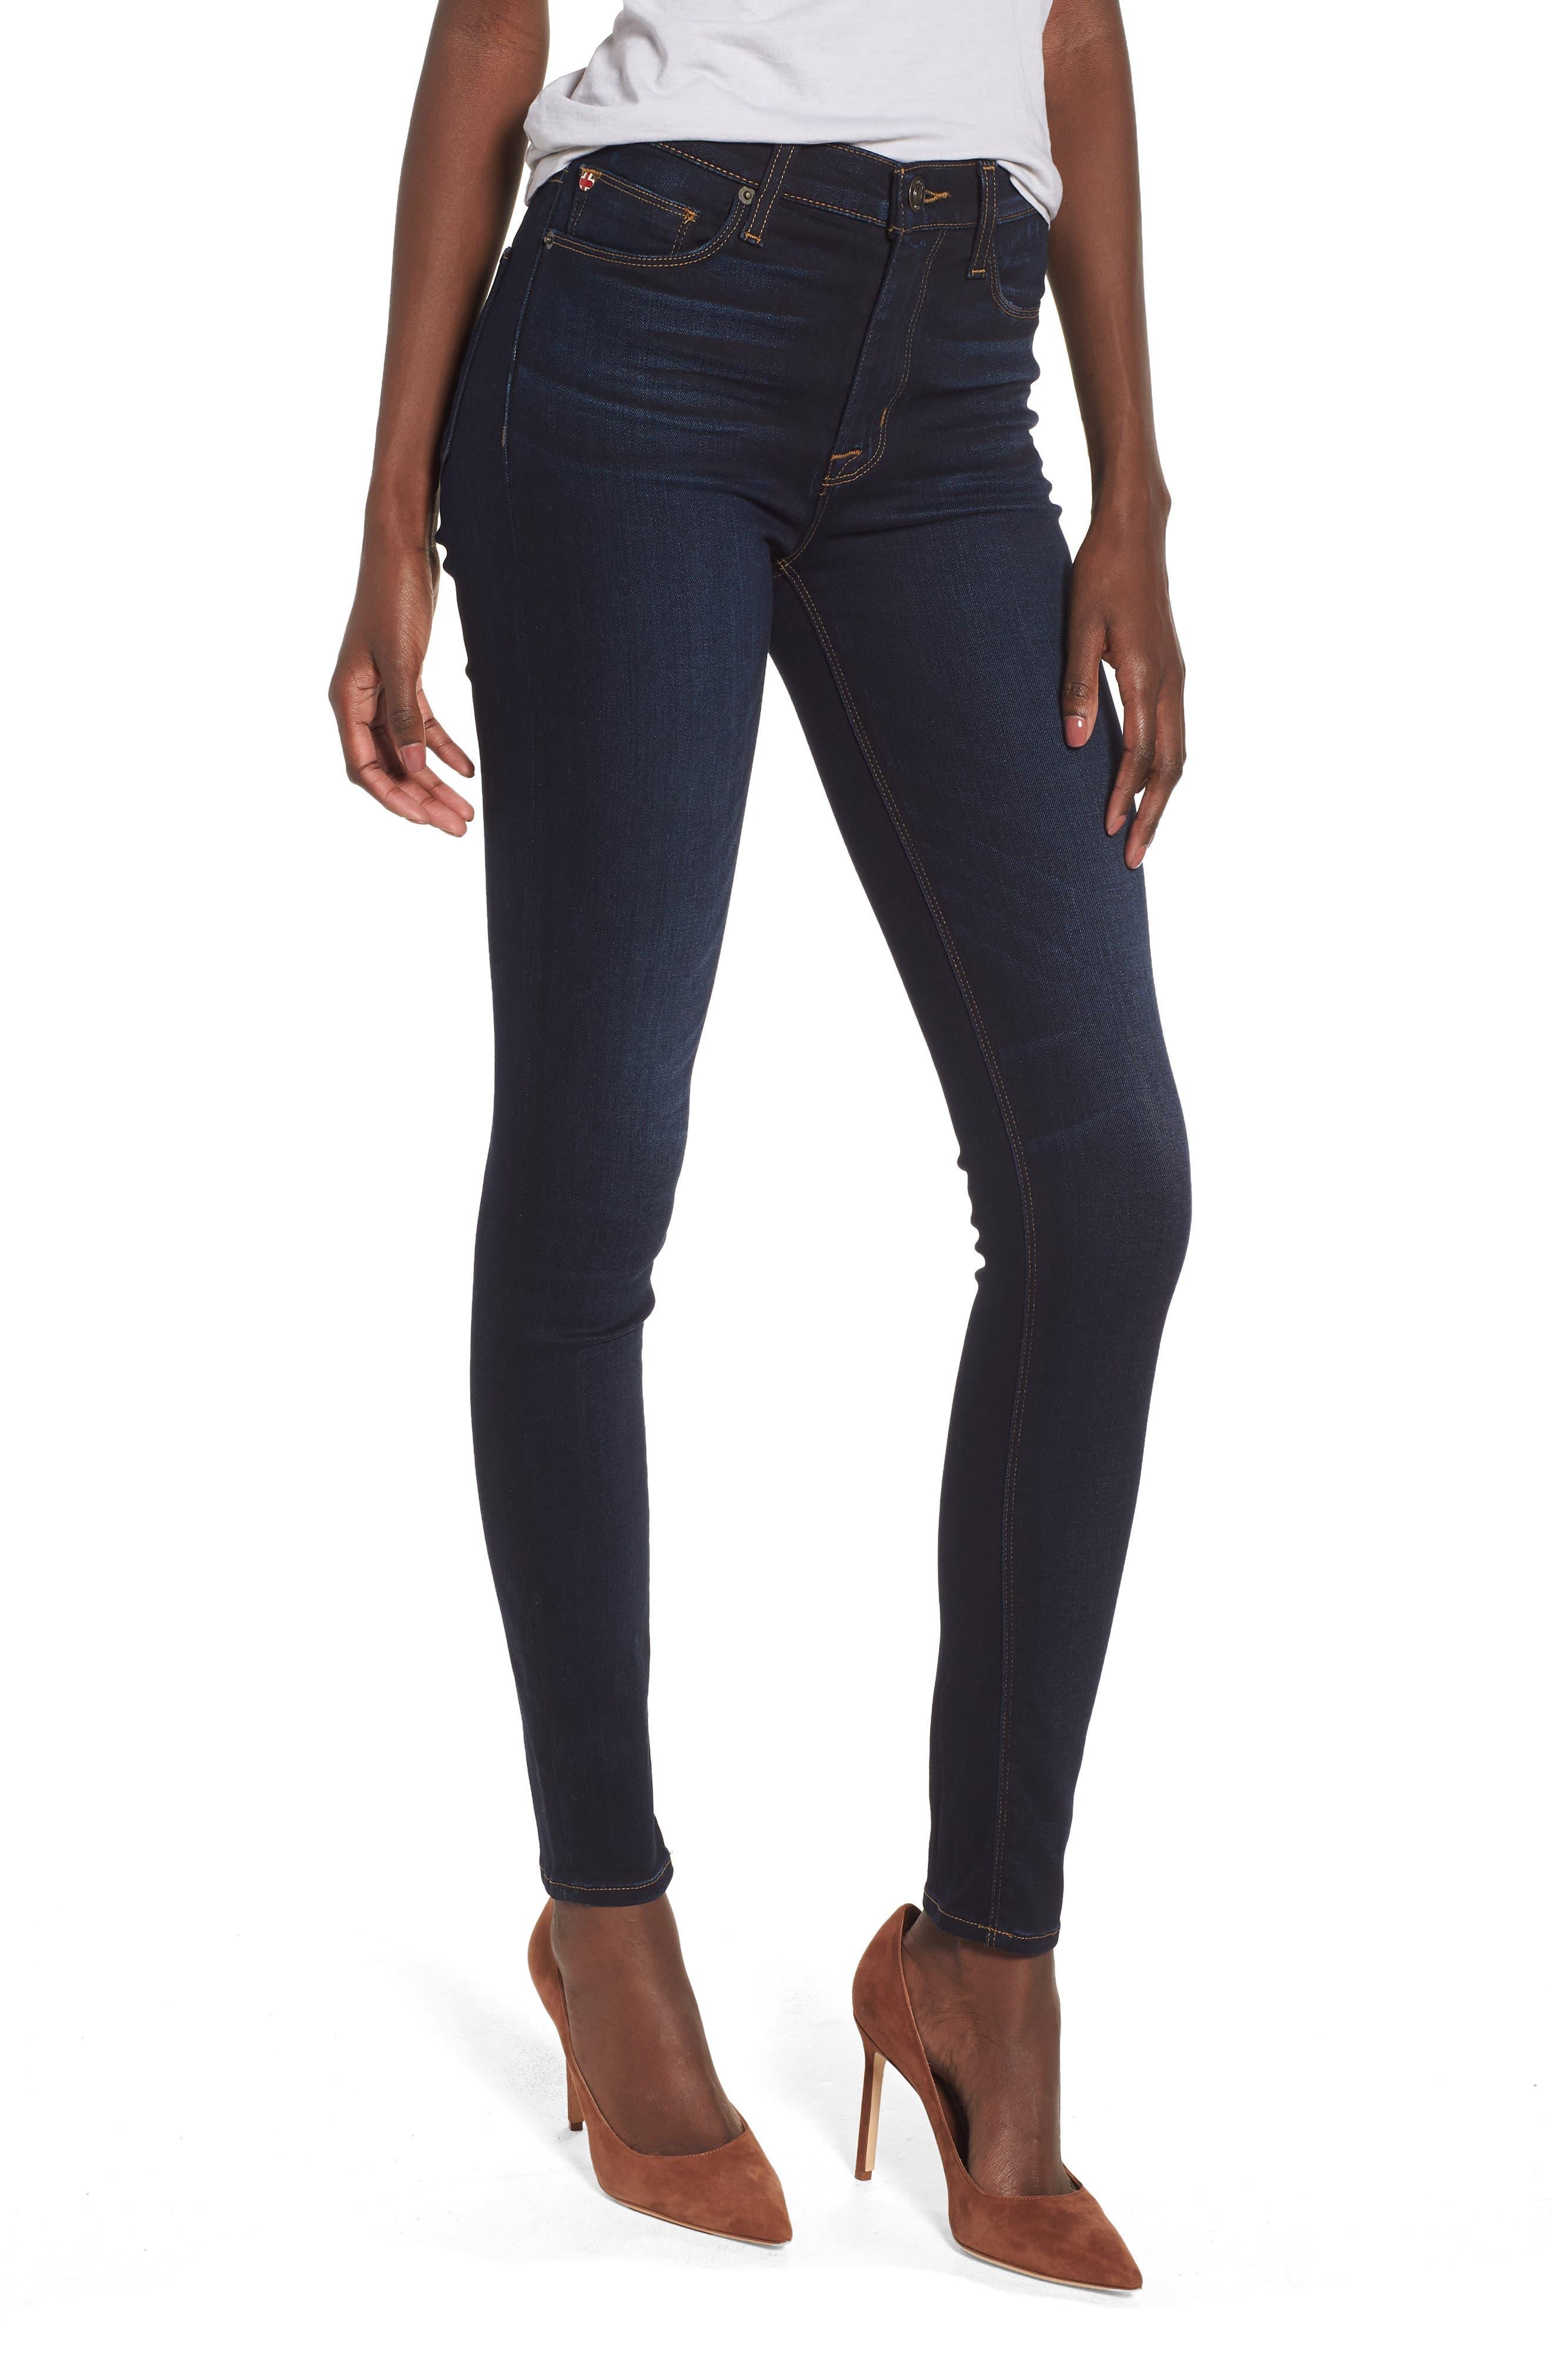 Barbara High Waist Ankle Supermodel Skinny Jeans,                             Main thumbnail 1, color,                             402